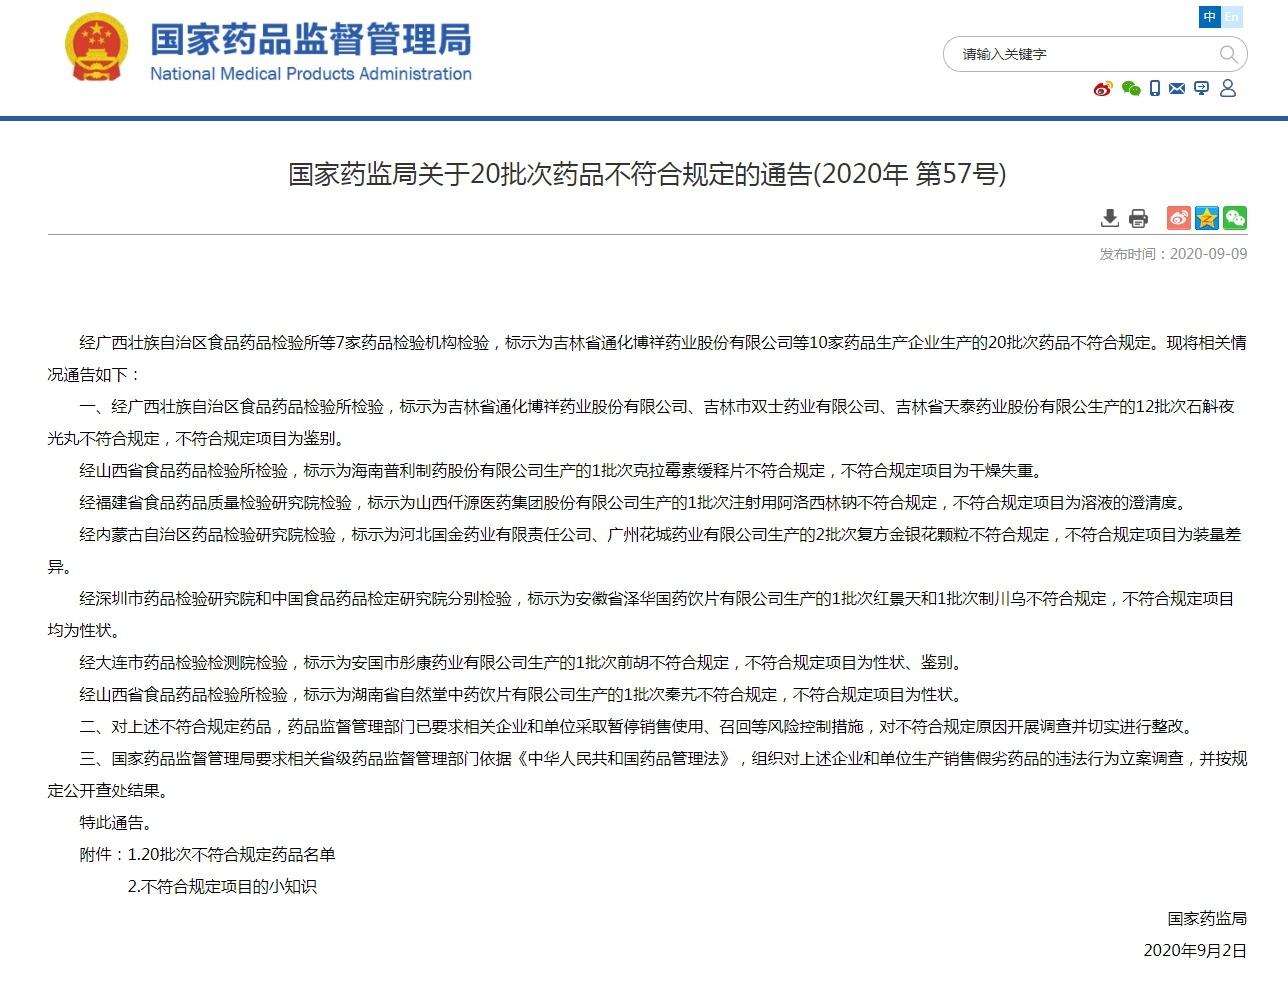 FireShot Capture 027 - 国家药监局关于20批次药品不符合规定的通告(2020年 第57号) - www.nmpa.gov.cn.png?x-oss-process=style/w10